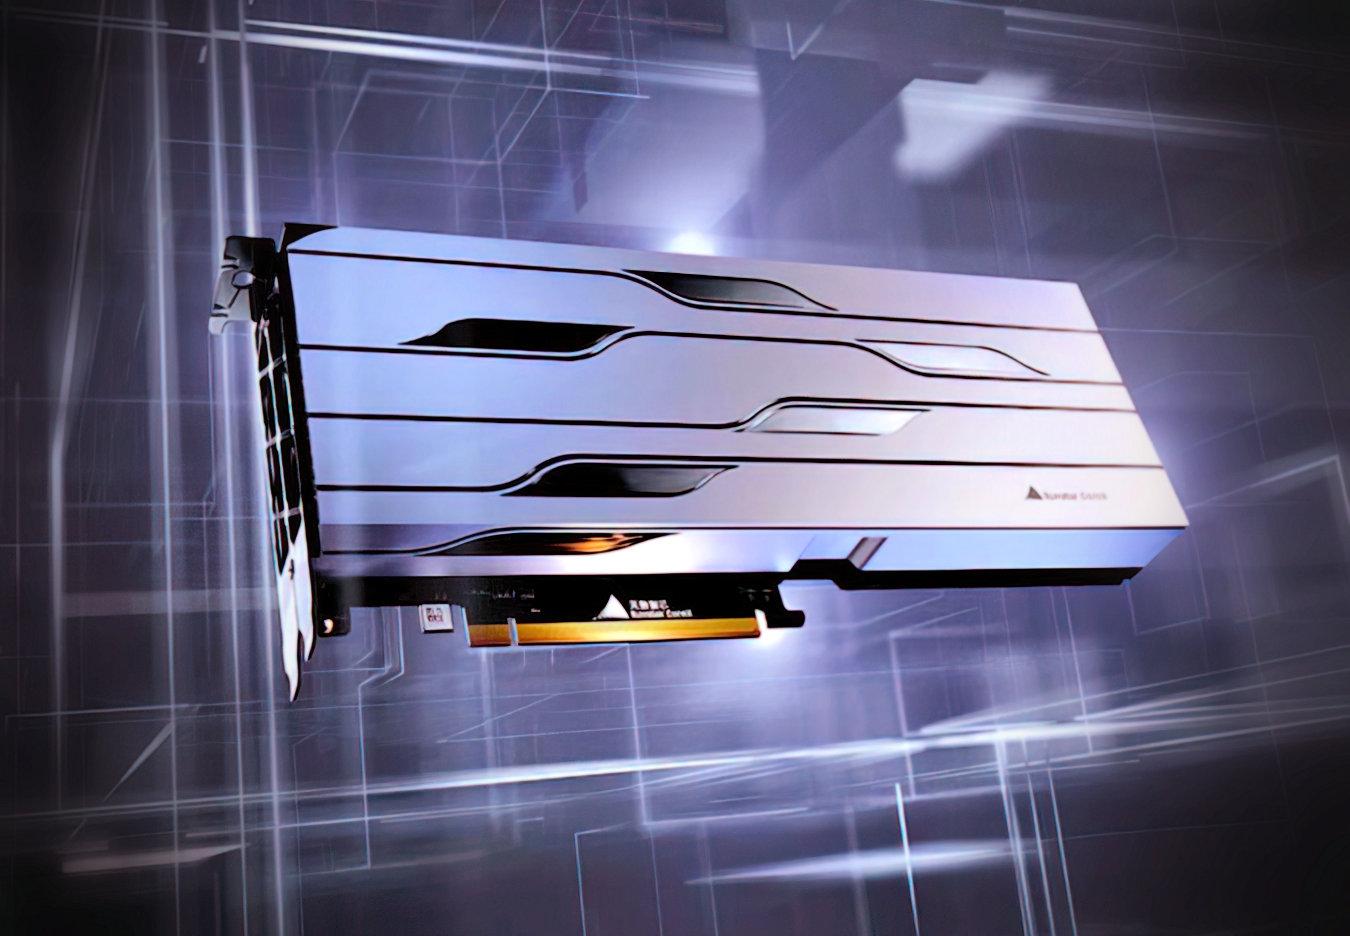 Tianshu Zhixin's Big Island GPU to feature TSMC 7nm node and up to 37 TFLOPS peak FP32 performance – VideoCardz.com